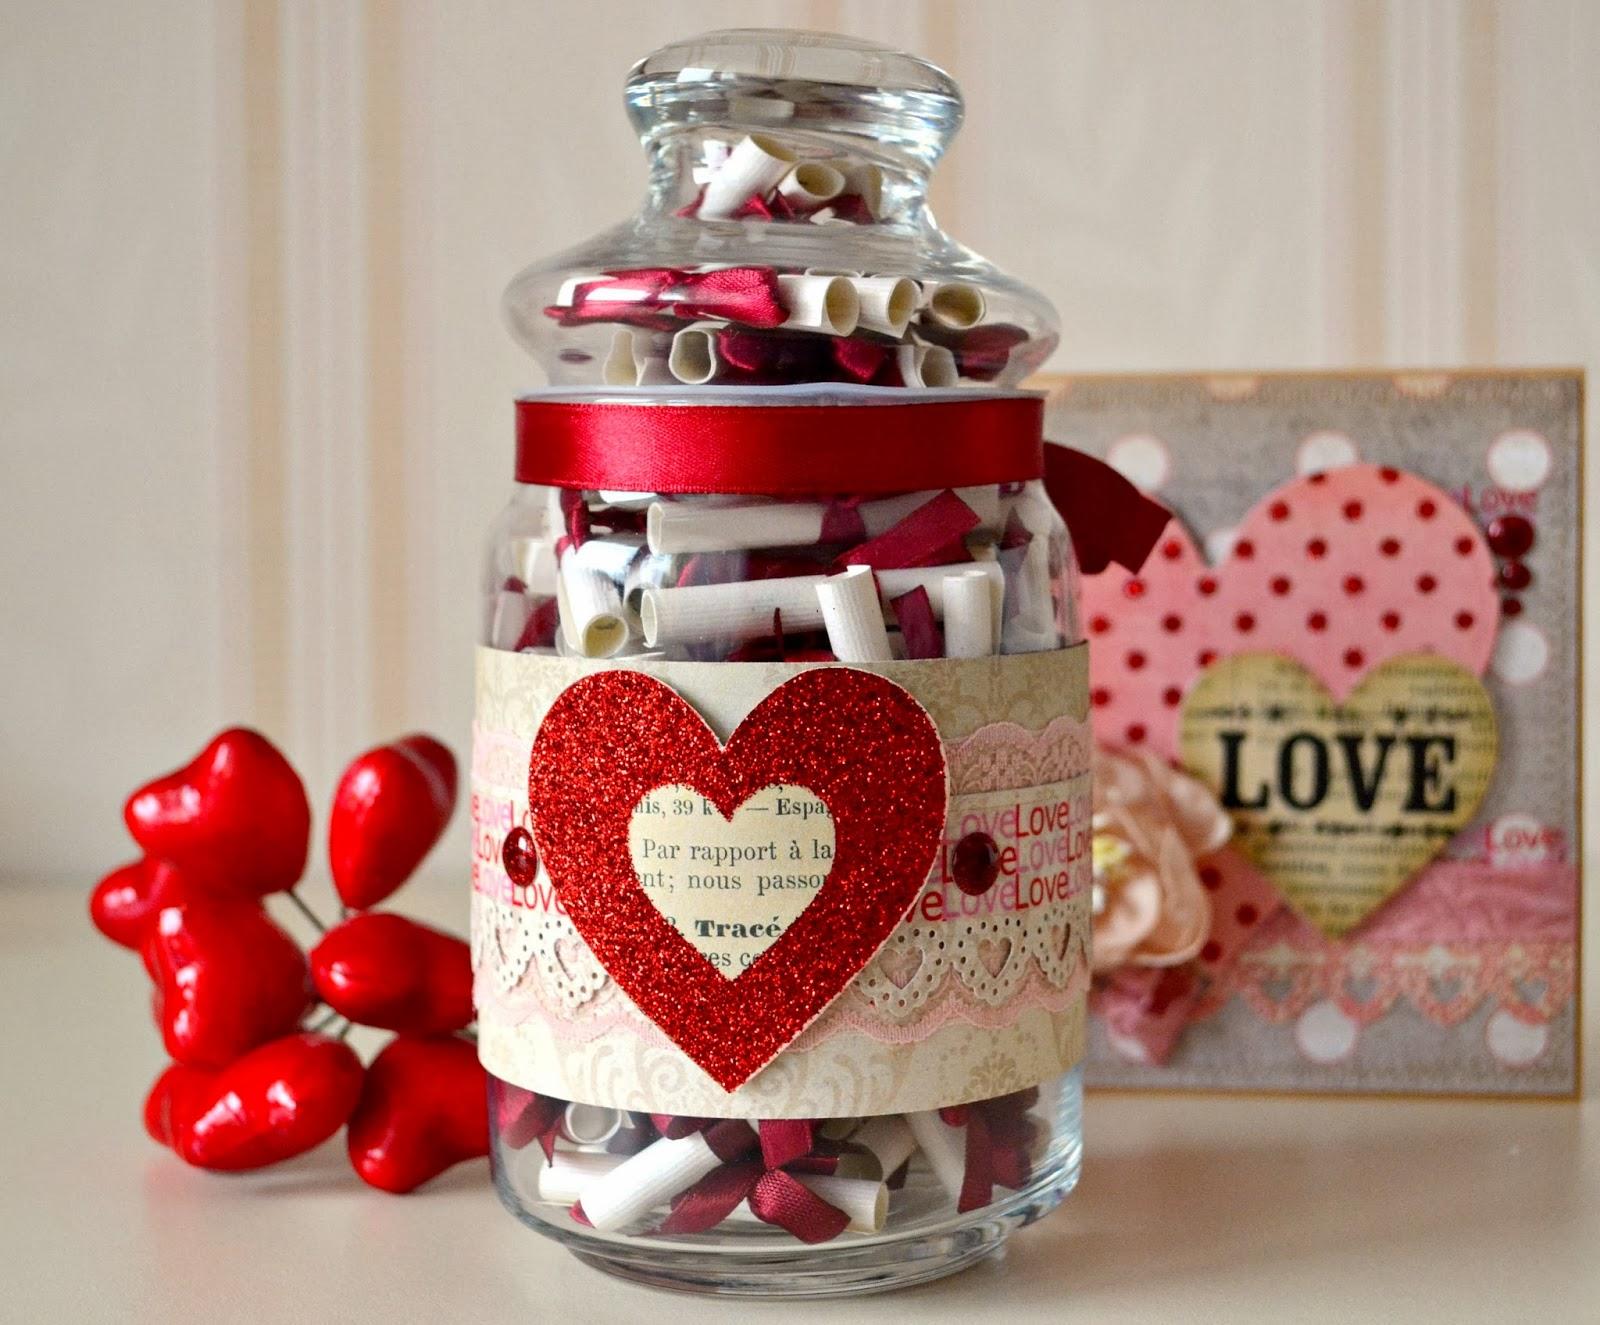 Подарок на 14 февраля своими руками декоративная банка